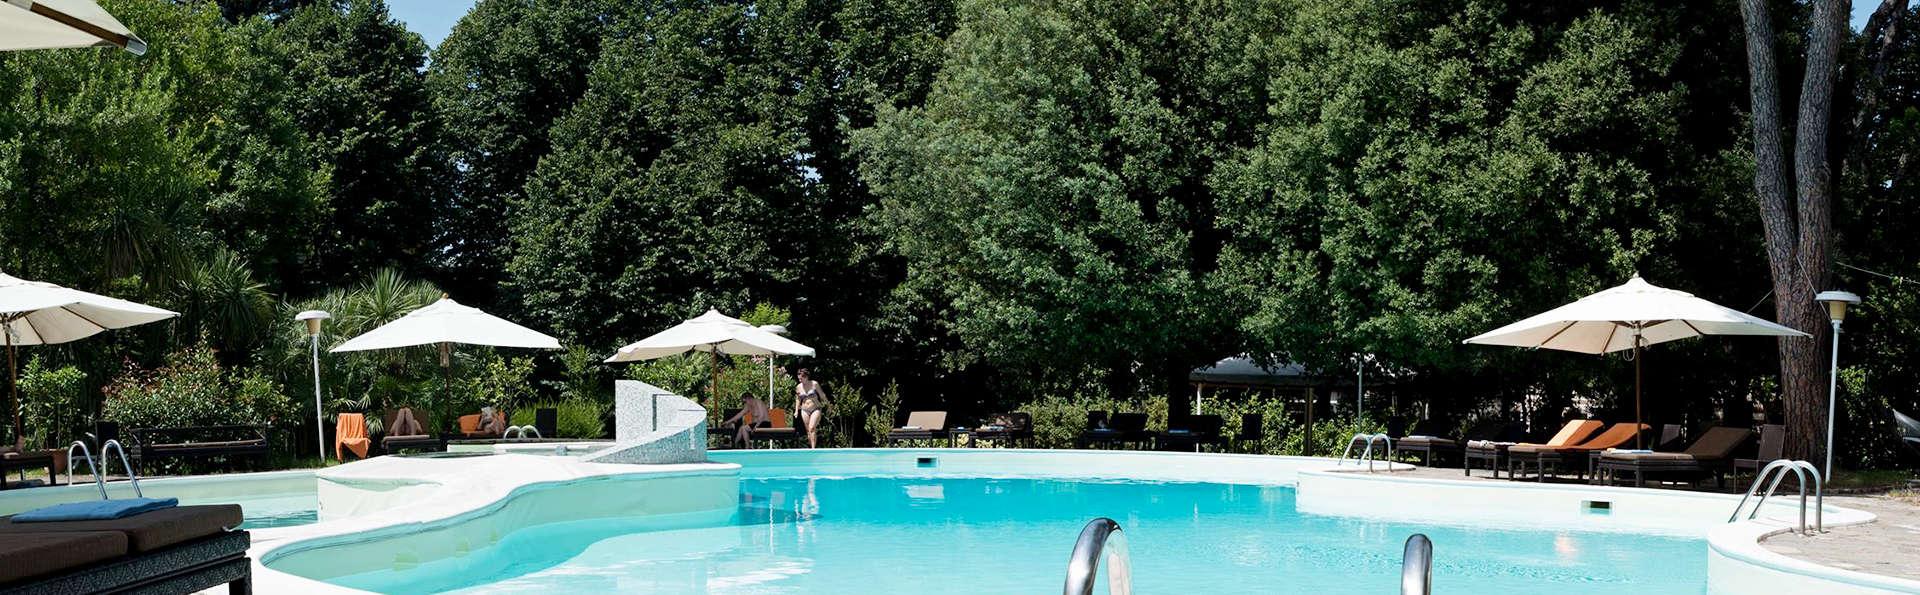 Grand Hotel & La Pace - Edit_Pool3.jpg